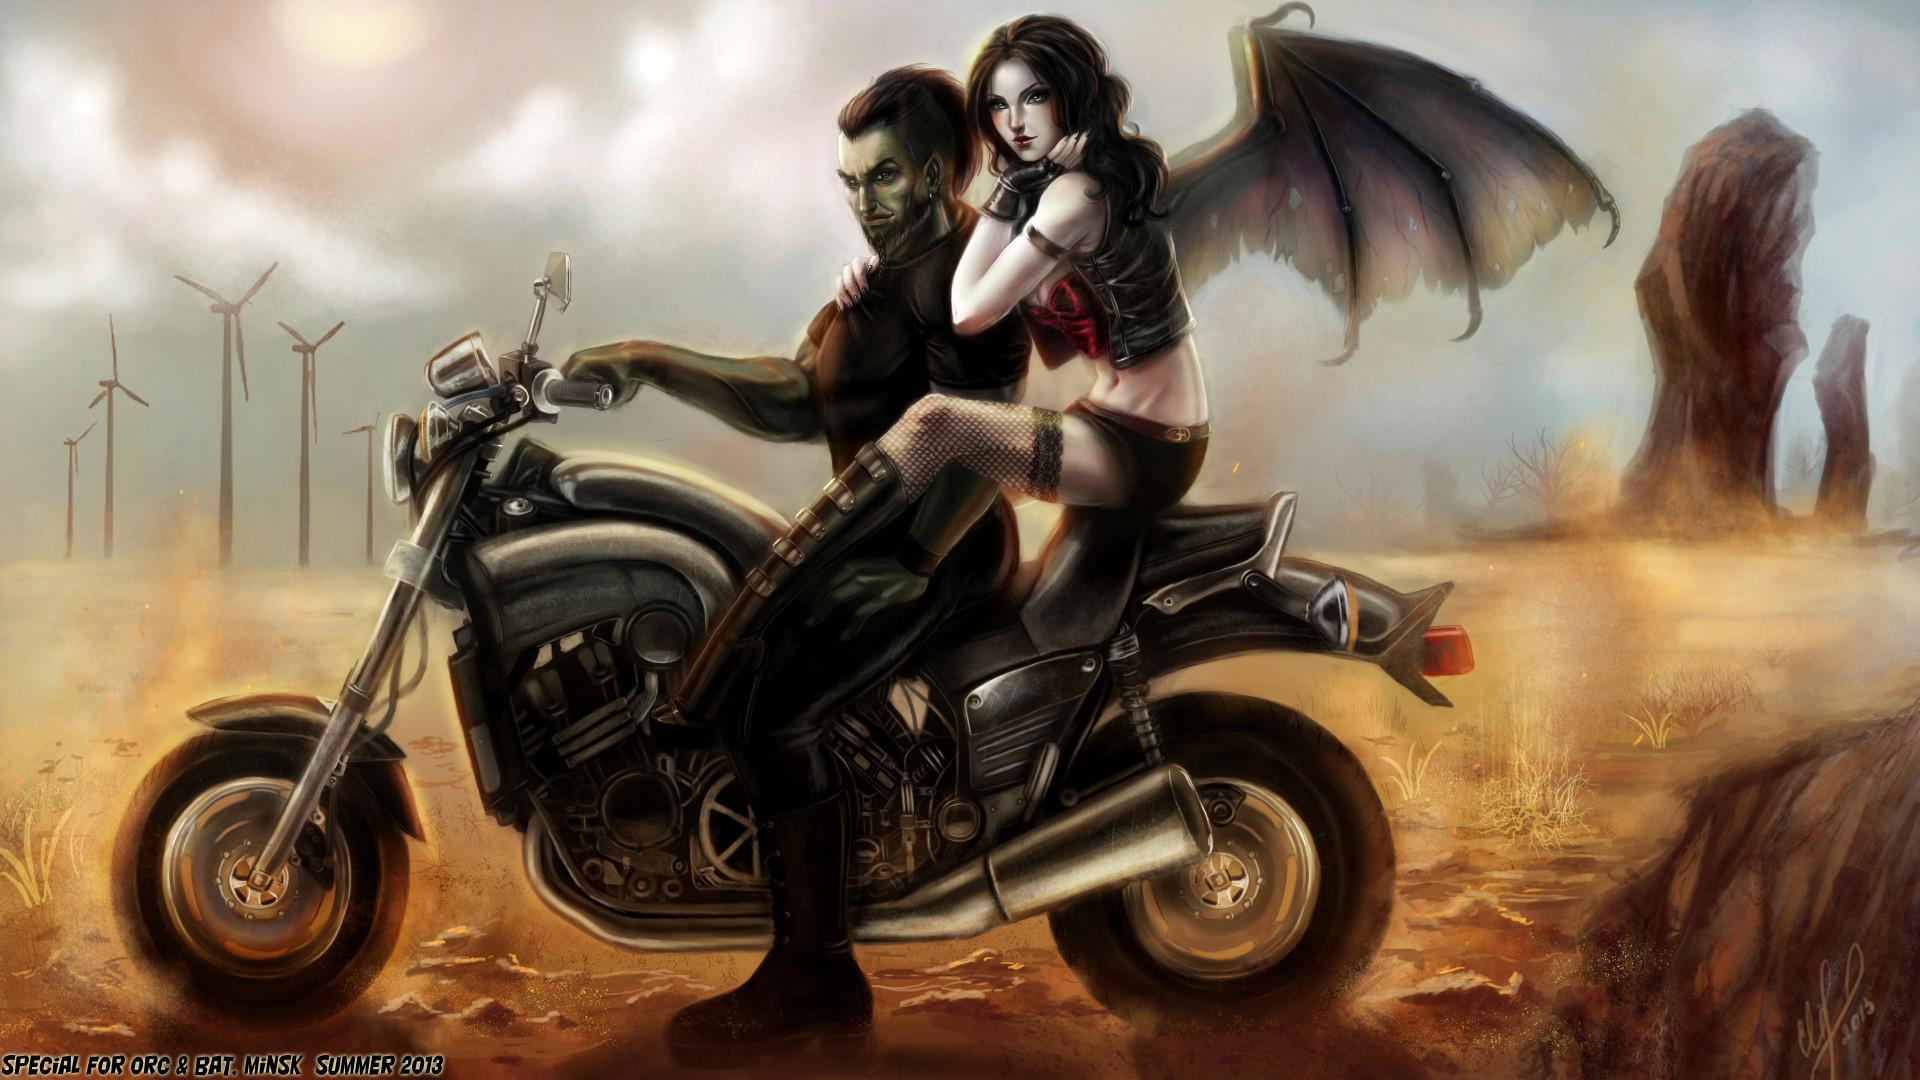 Vampire Men Wings Fantasy Motorcycle Girls fantasy wallpaper | |  147154 | WallpaperUP